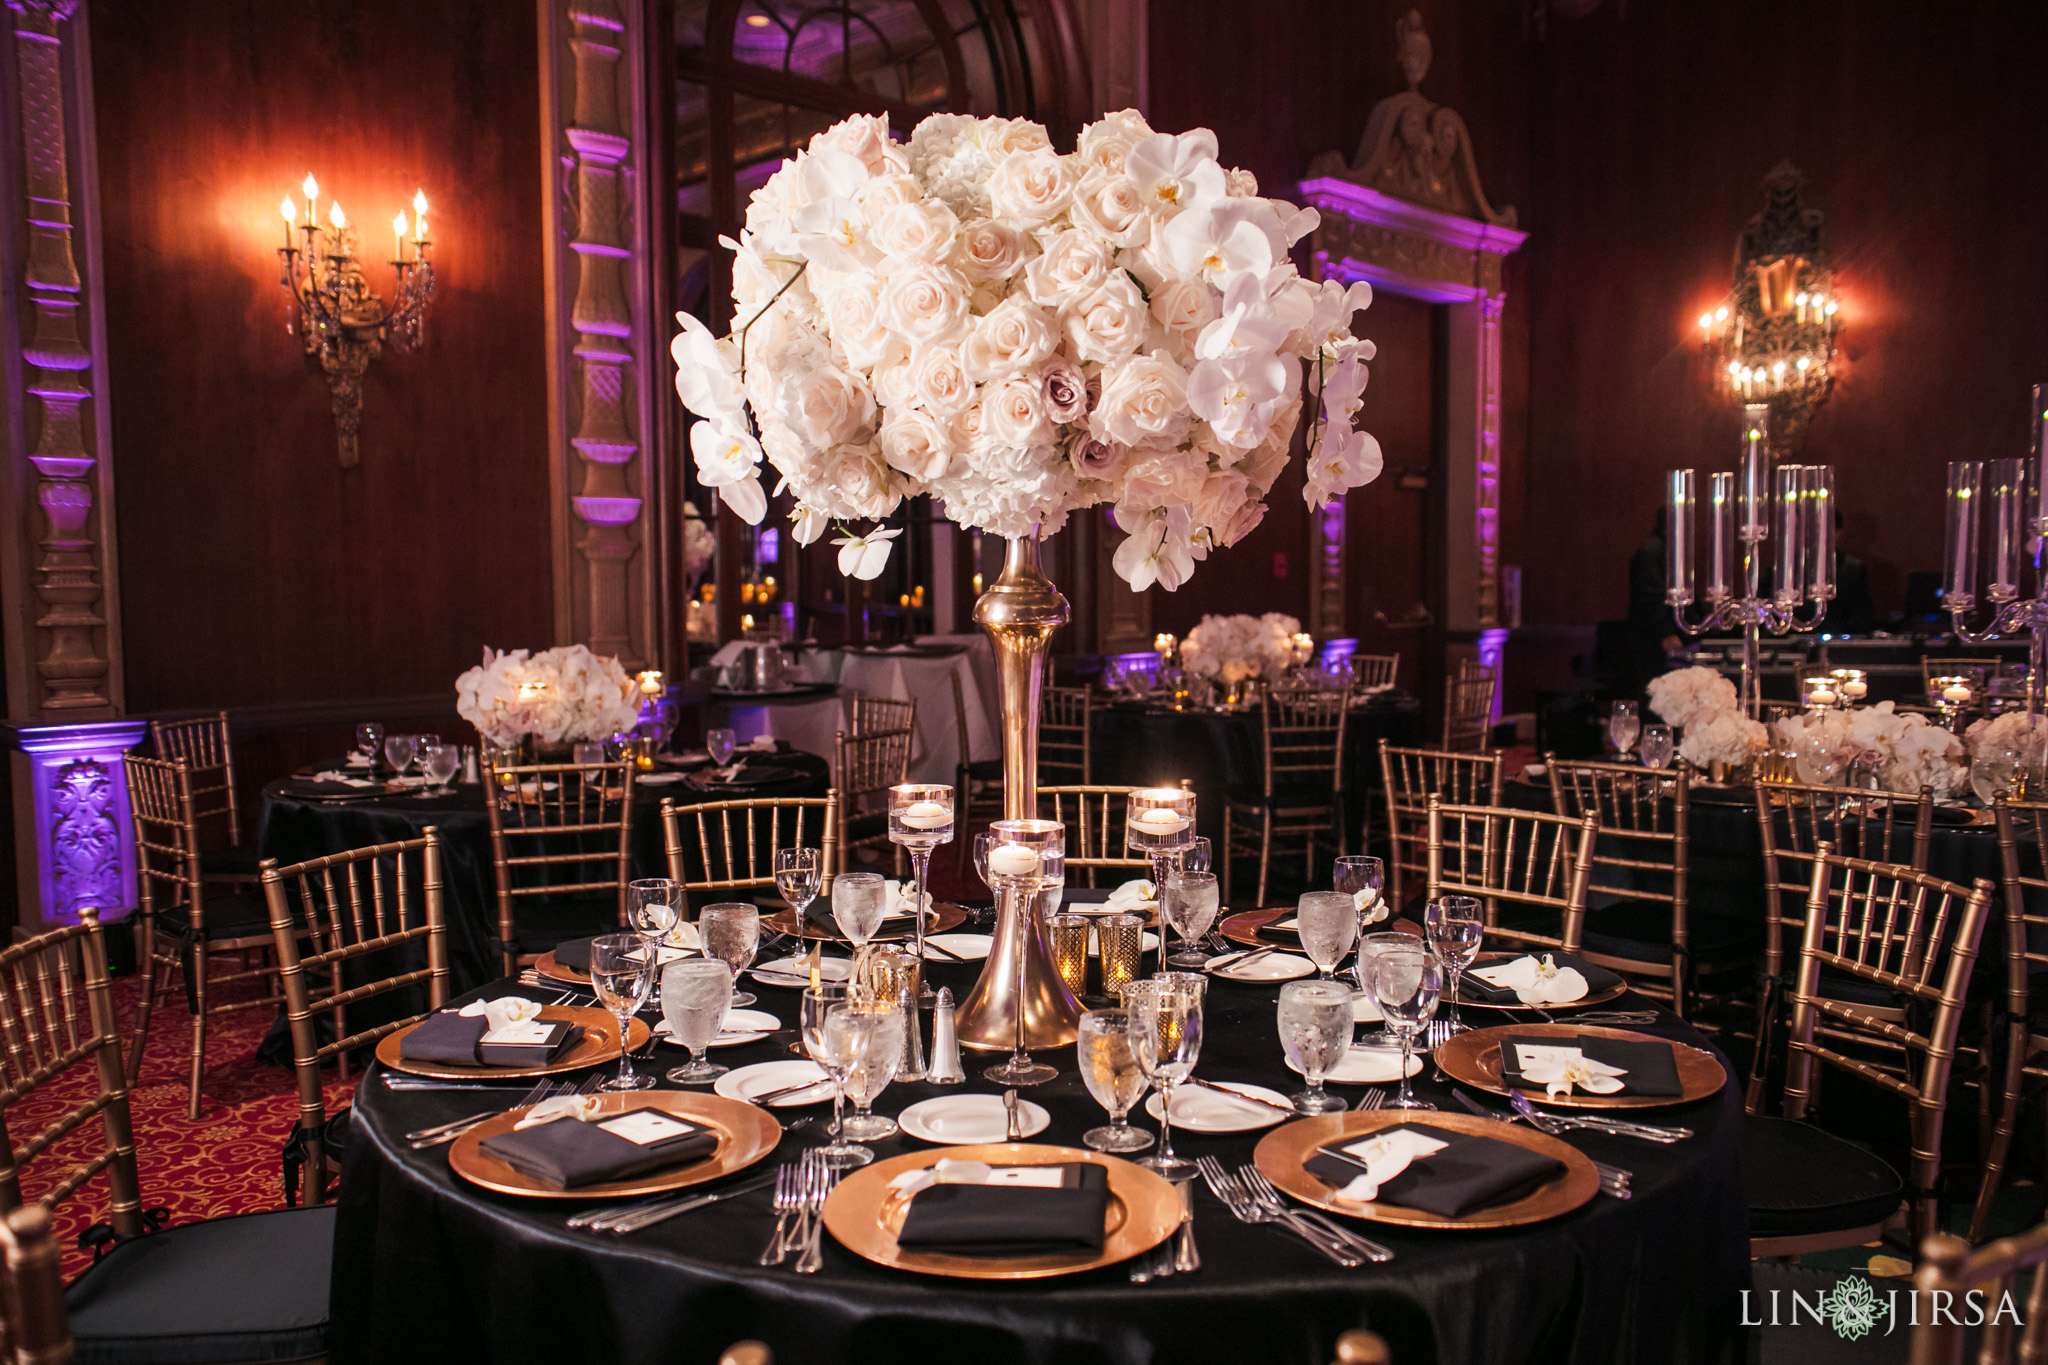 020 millennium biltmore hotel los angeles wedding photography